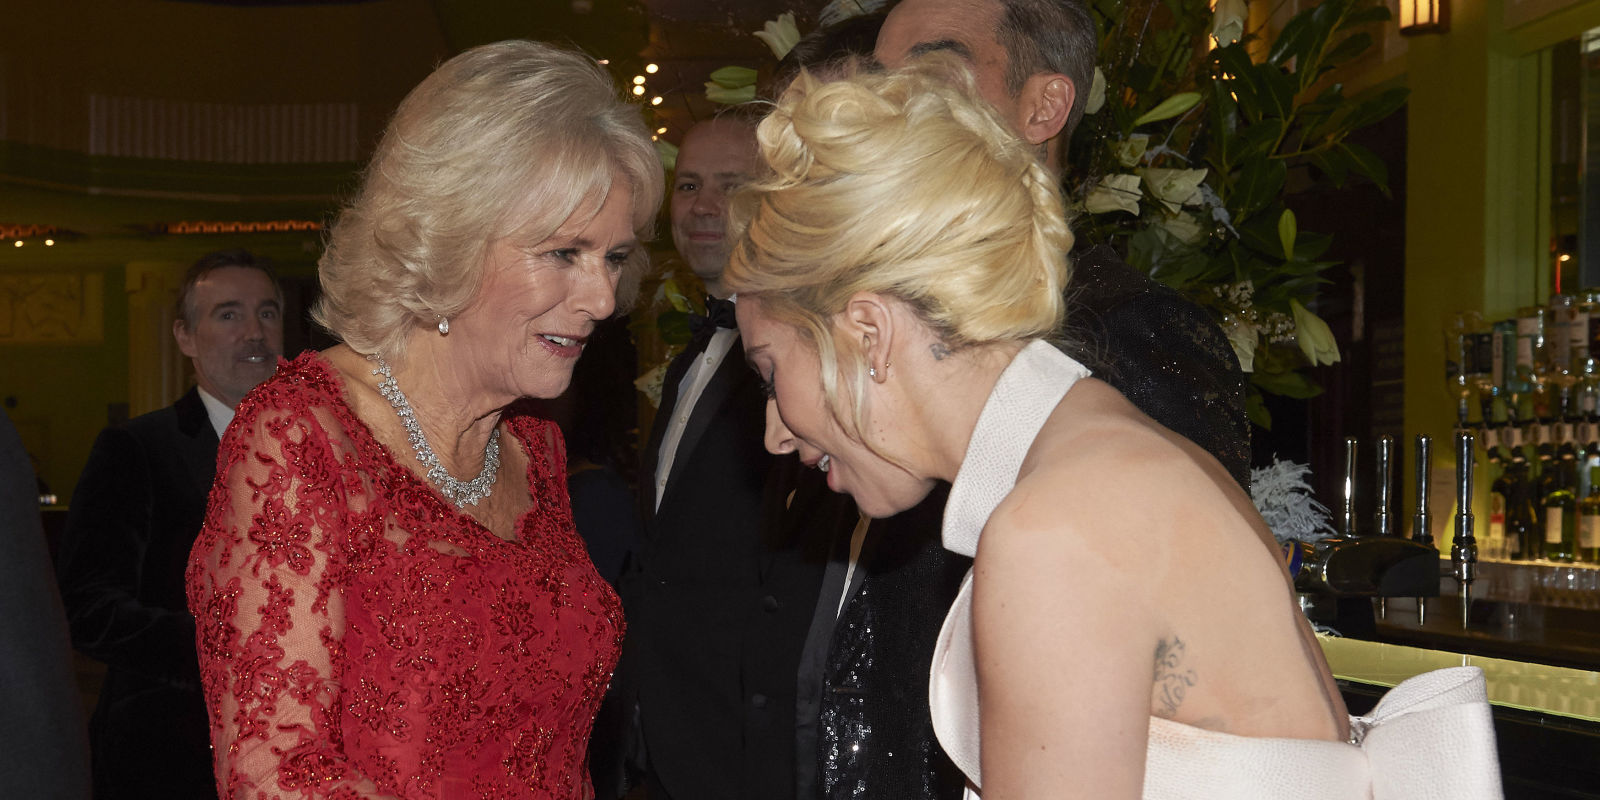 The Duchess Of Cornwall Has A Moment With Lady Gaga At Royal Variety